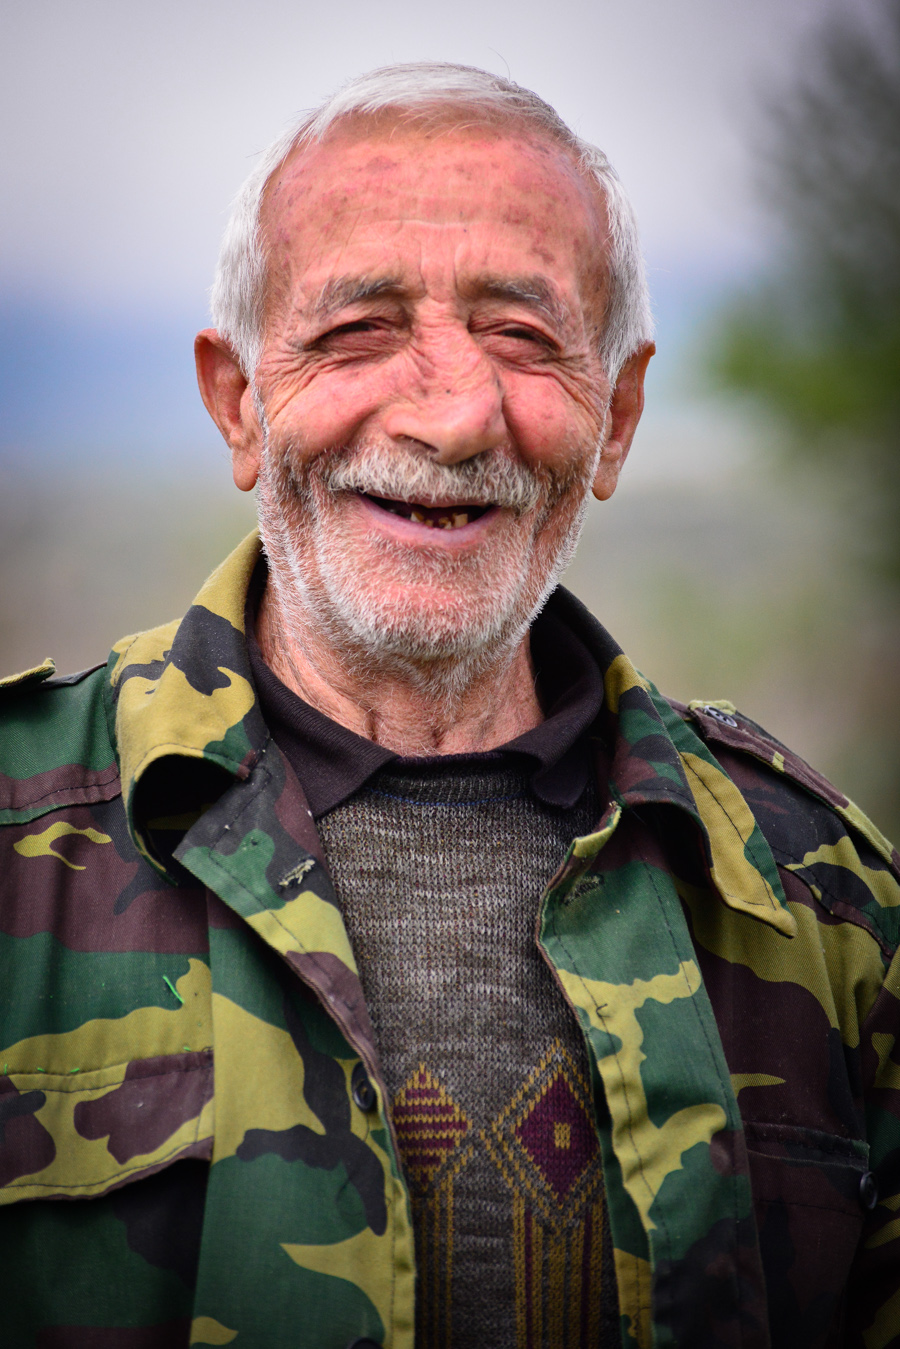 Nagorno Karabakh-Marko-Moudrak-9487.jpg